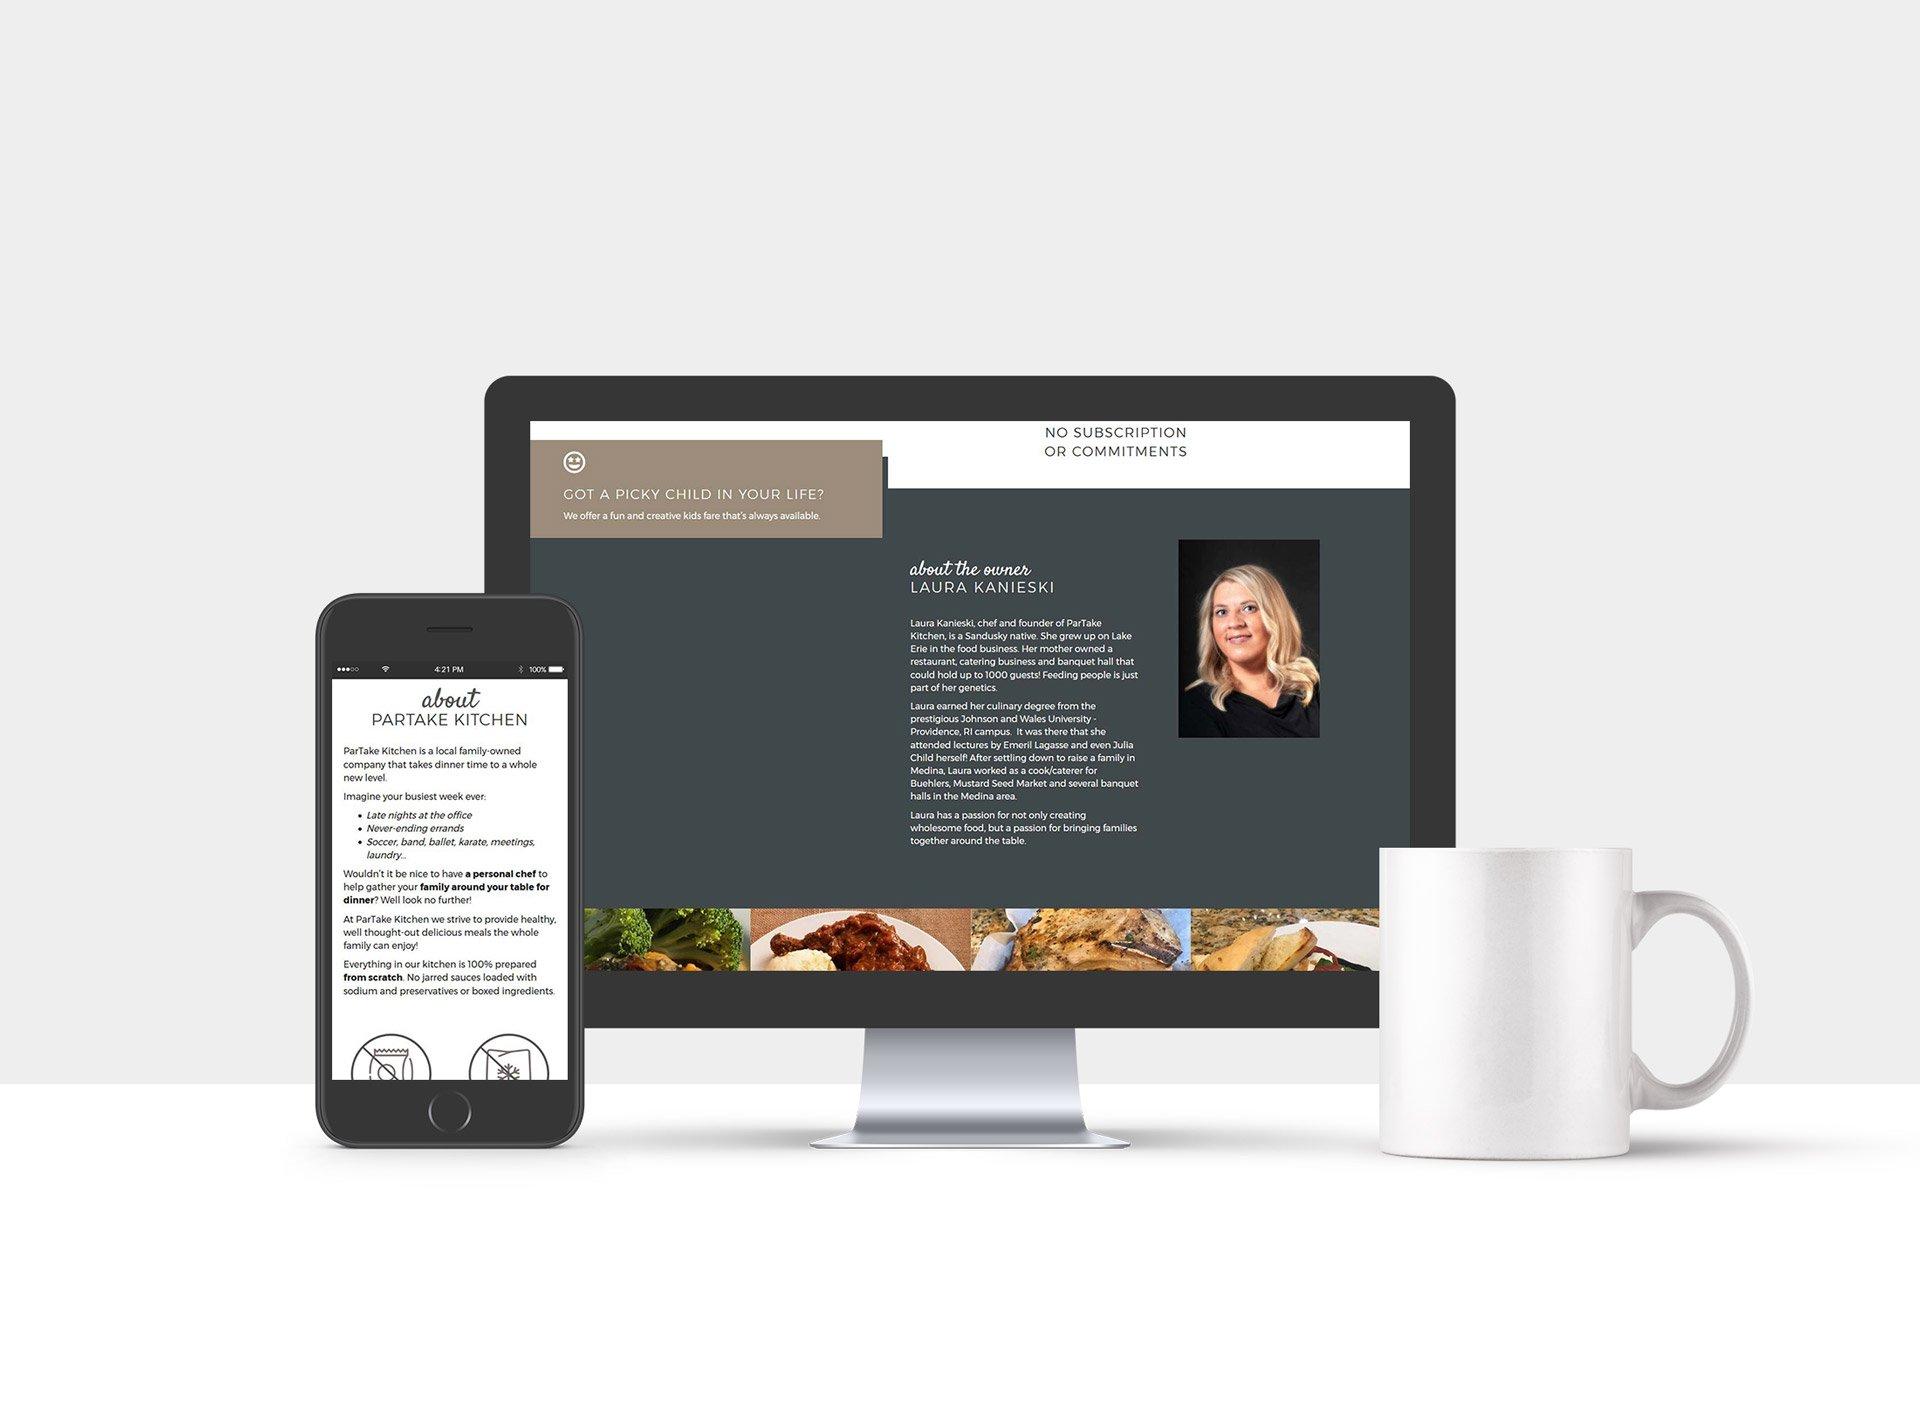 Website Design for ParTake Kitchen Meal Prep restaurant